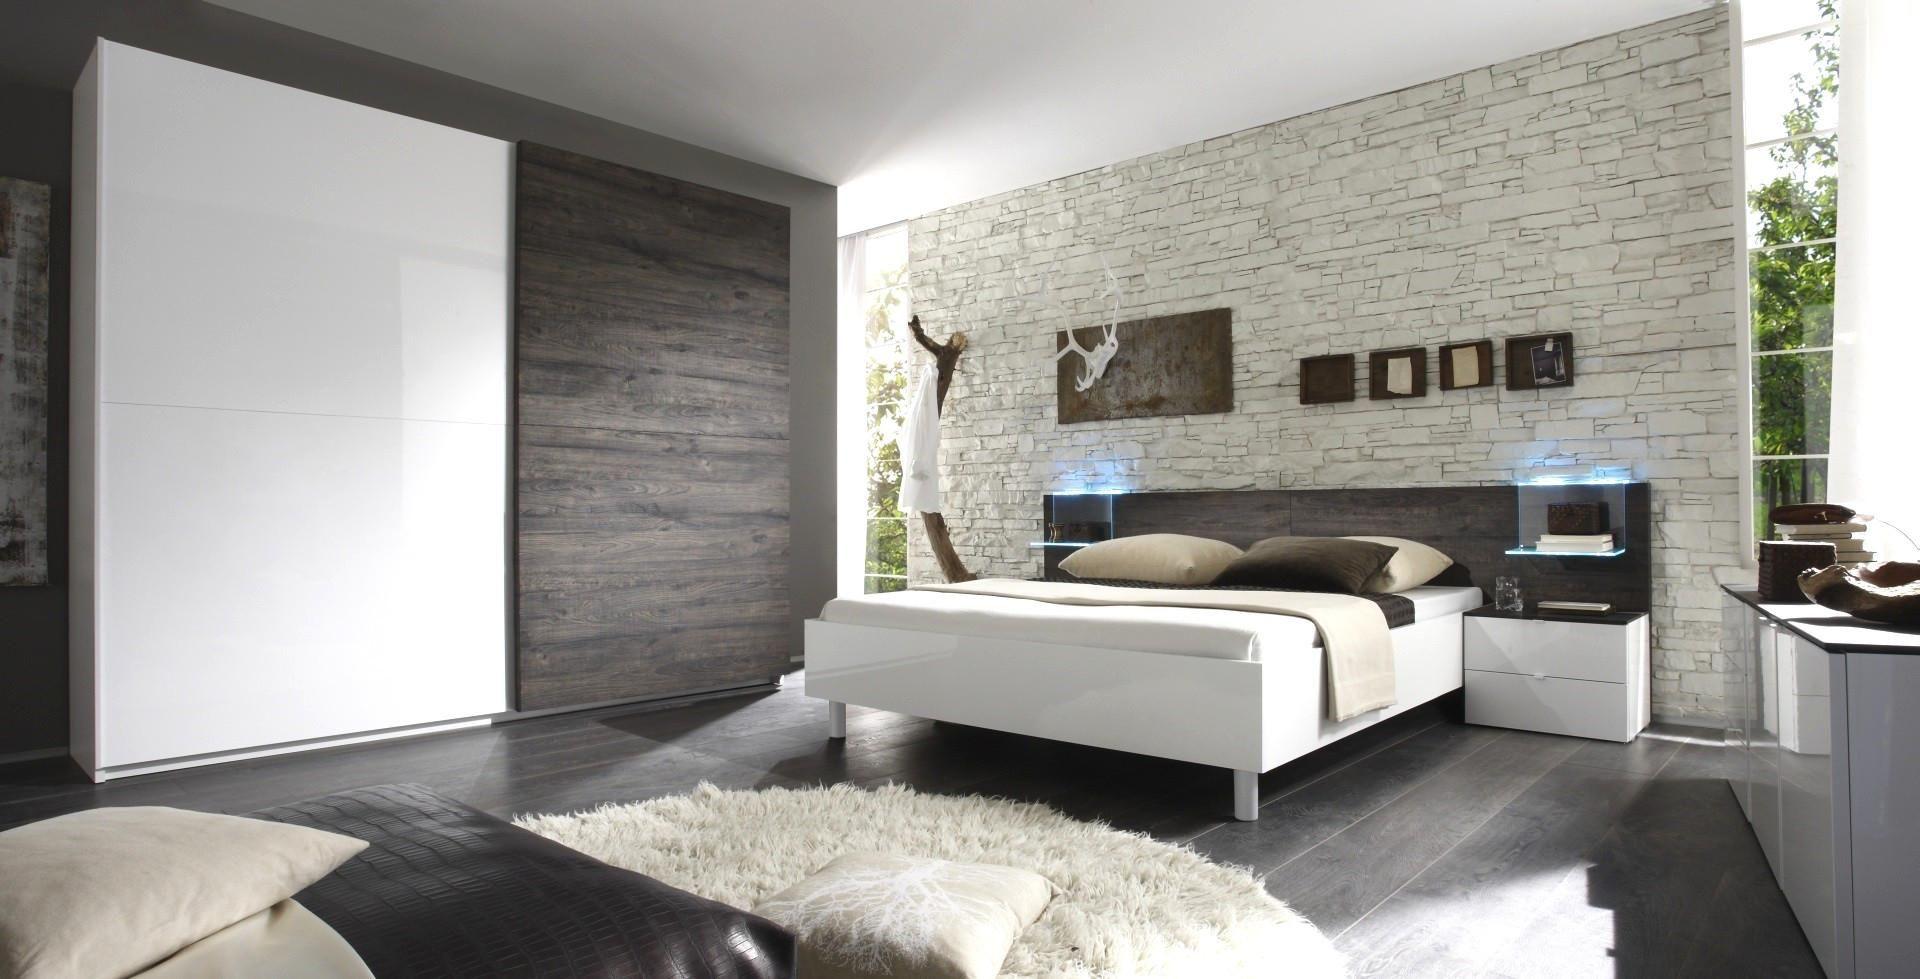 38 Deco Chambre Blanc Gris Noir In 2020 White Bedroom Modern Modern Bedroom Home